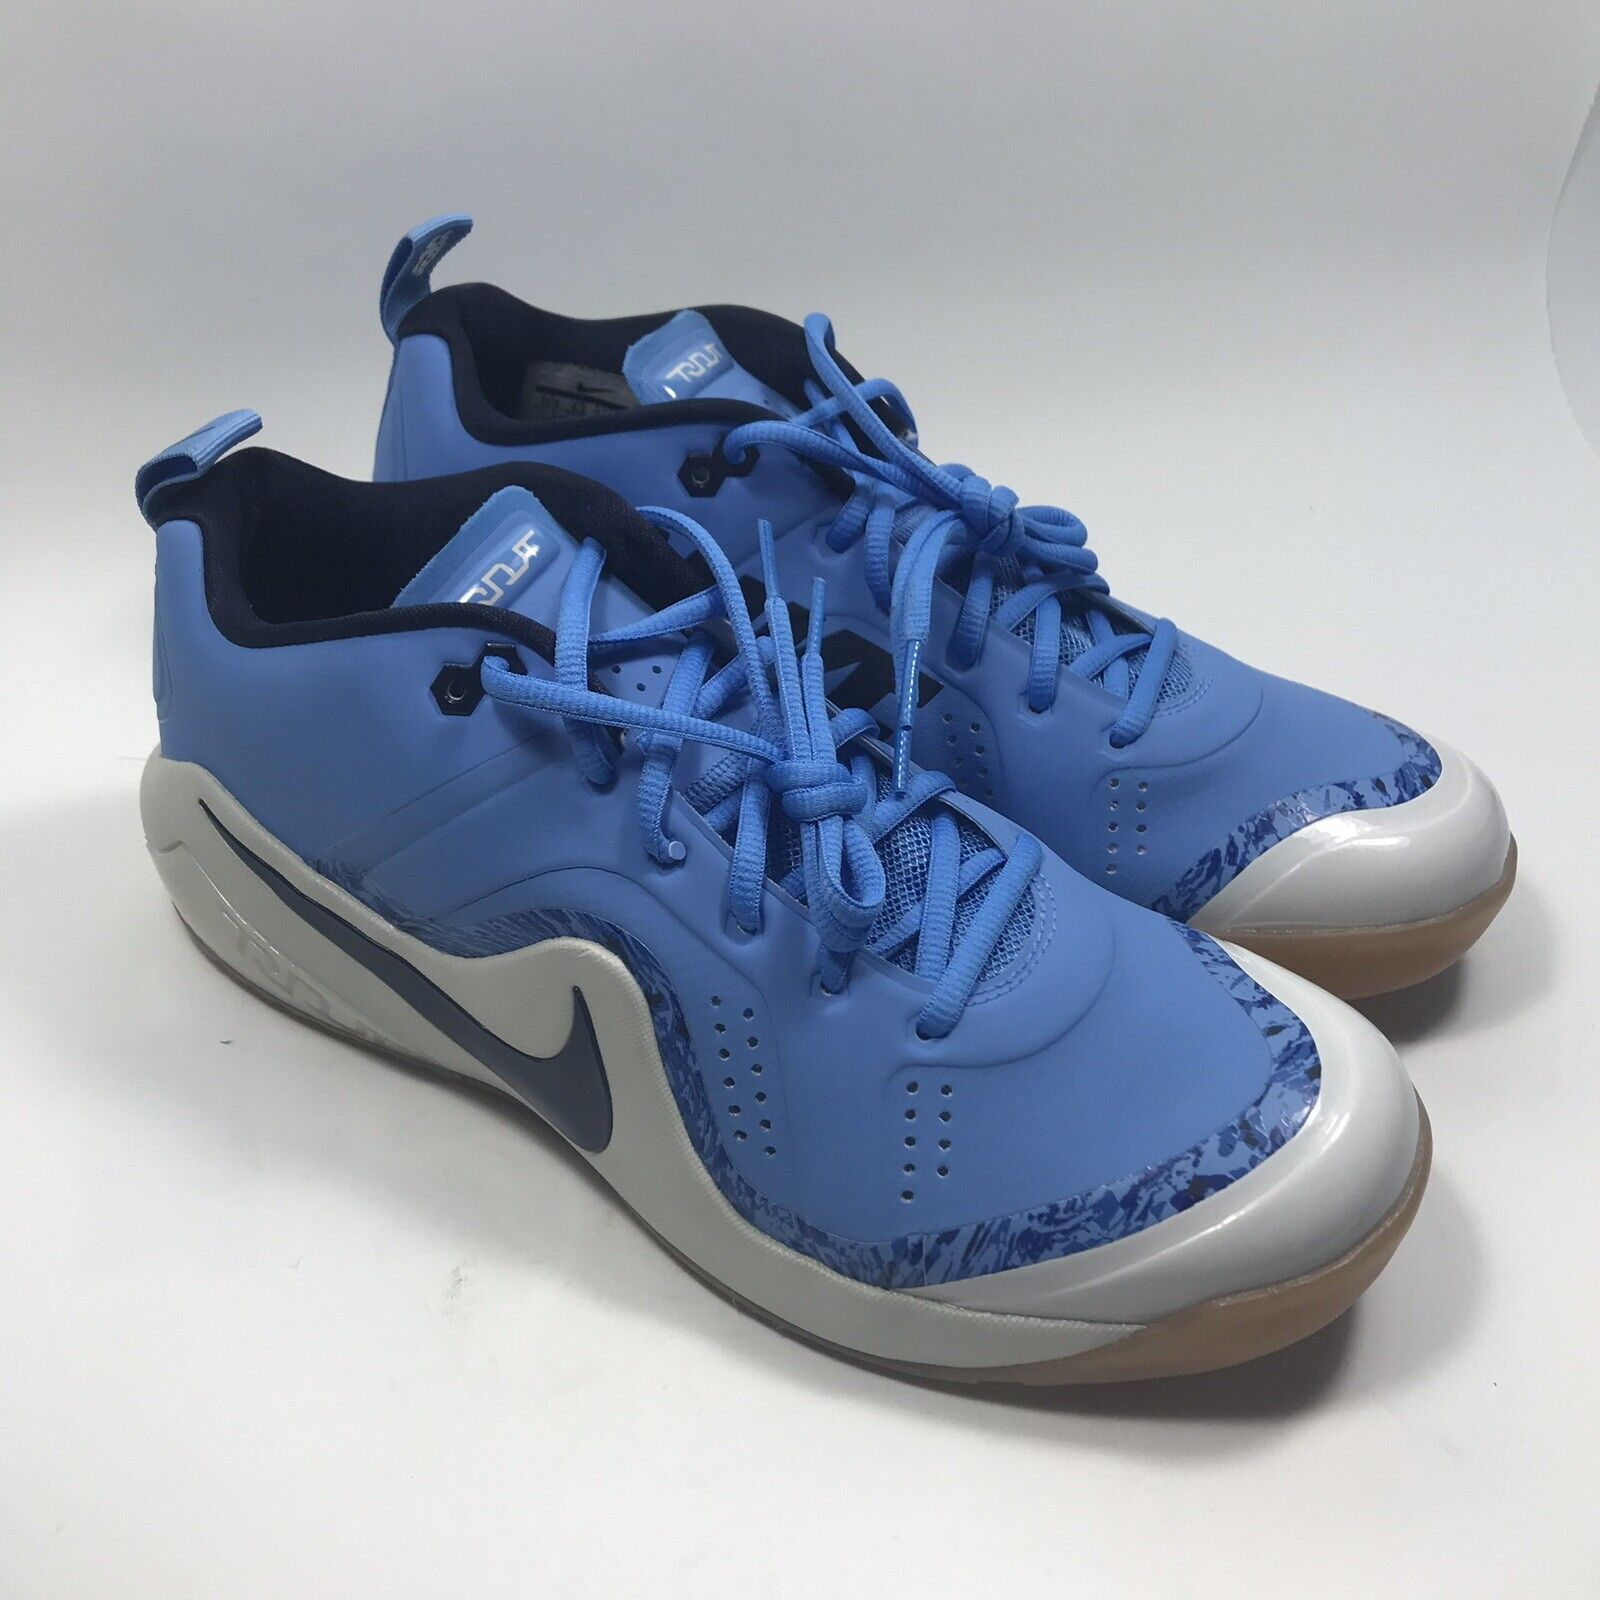 NEW Nike Zoom Trout 4 Turf Baseball shoes Black UNC bluee 917838-440 SZ 13